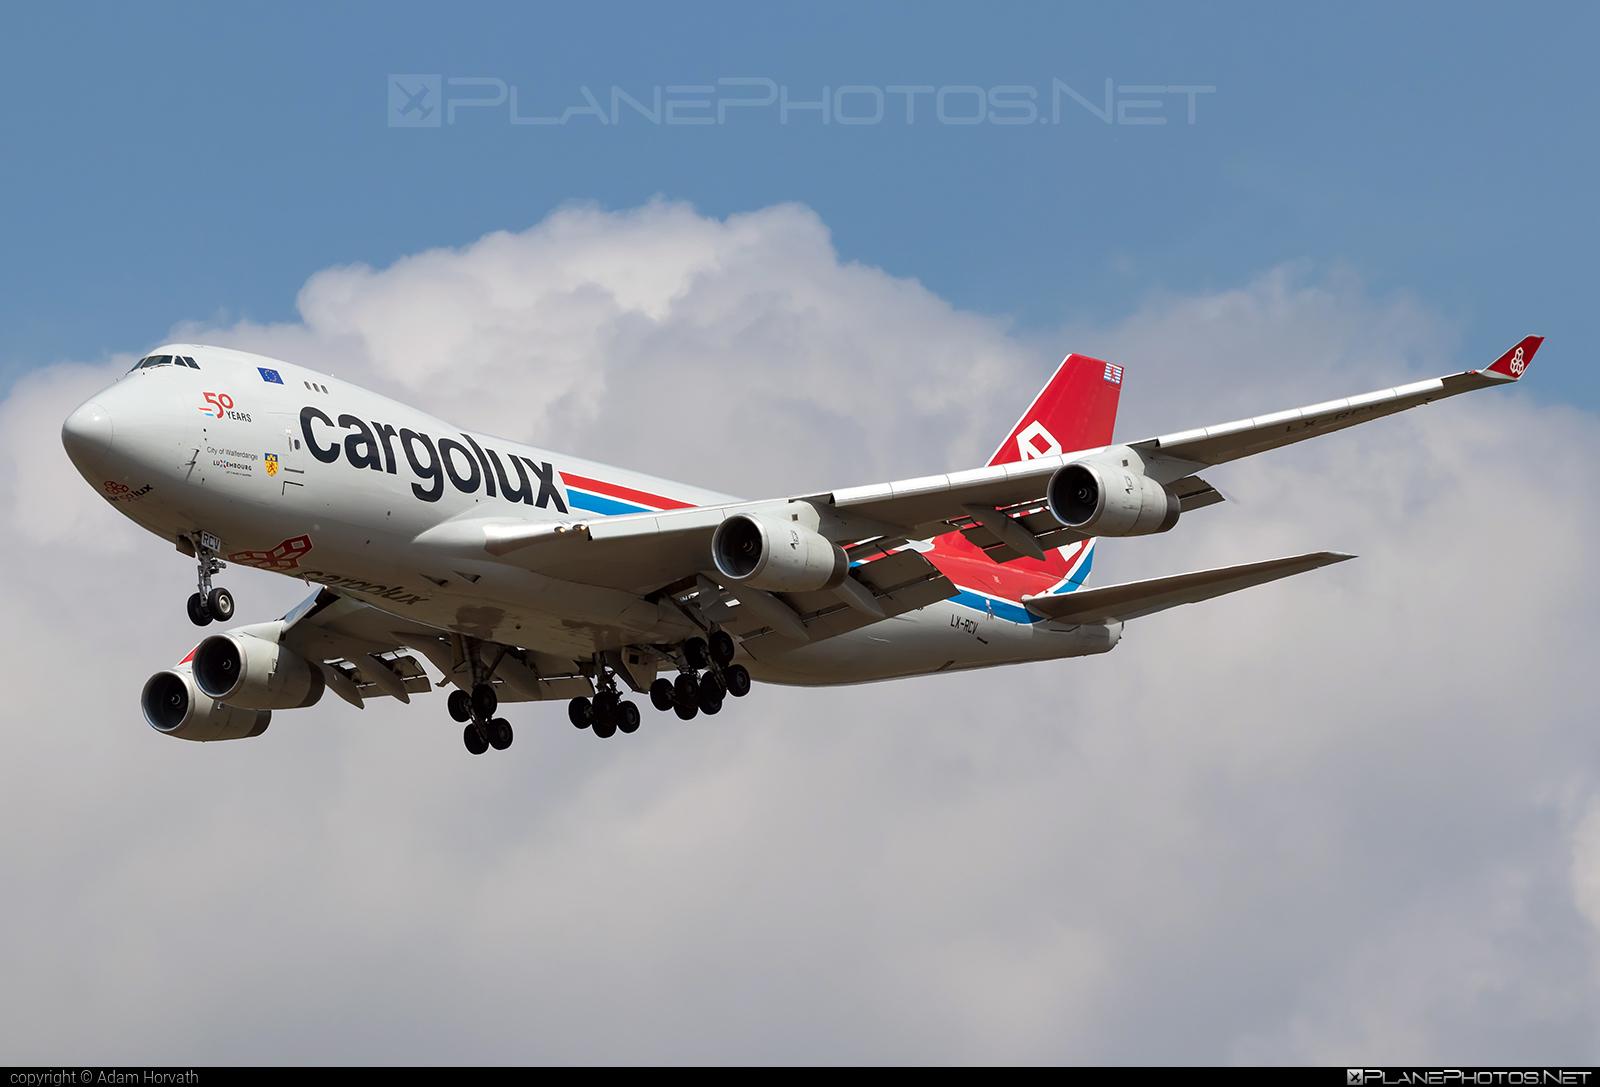 Boeing 747-400F - LX-RCV operated by Cargolux Italia #b747 #boeing #boeing747 #cargolux #cargoluxitalia #jumbo